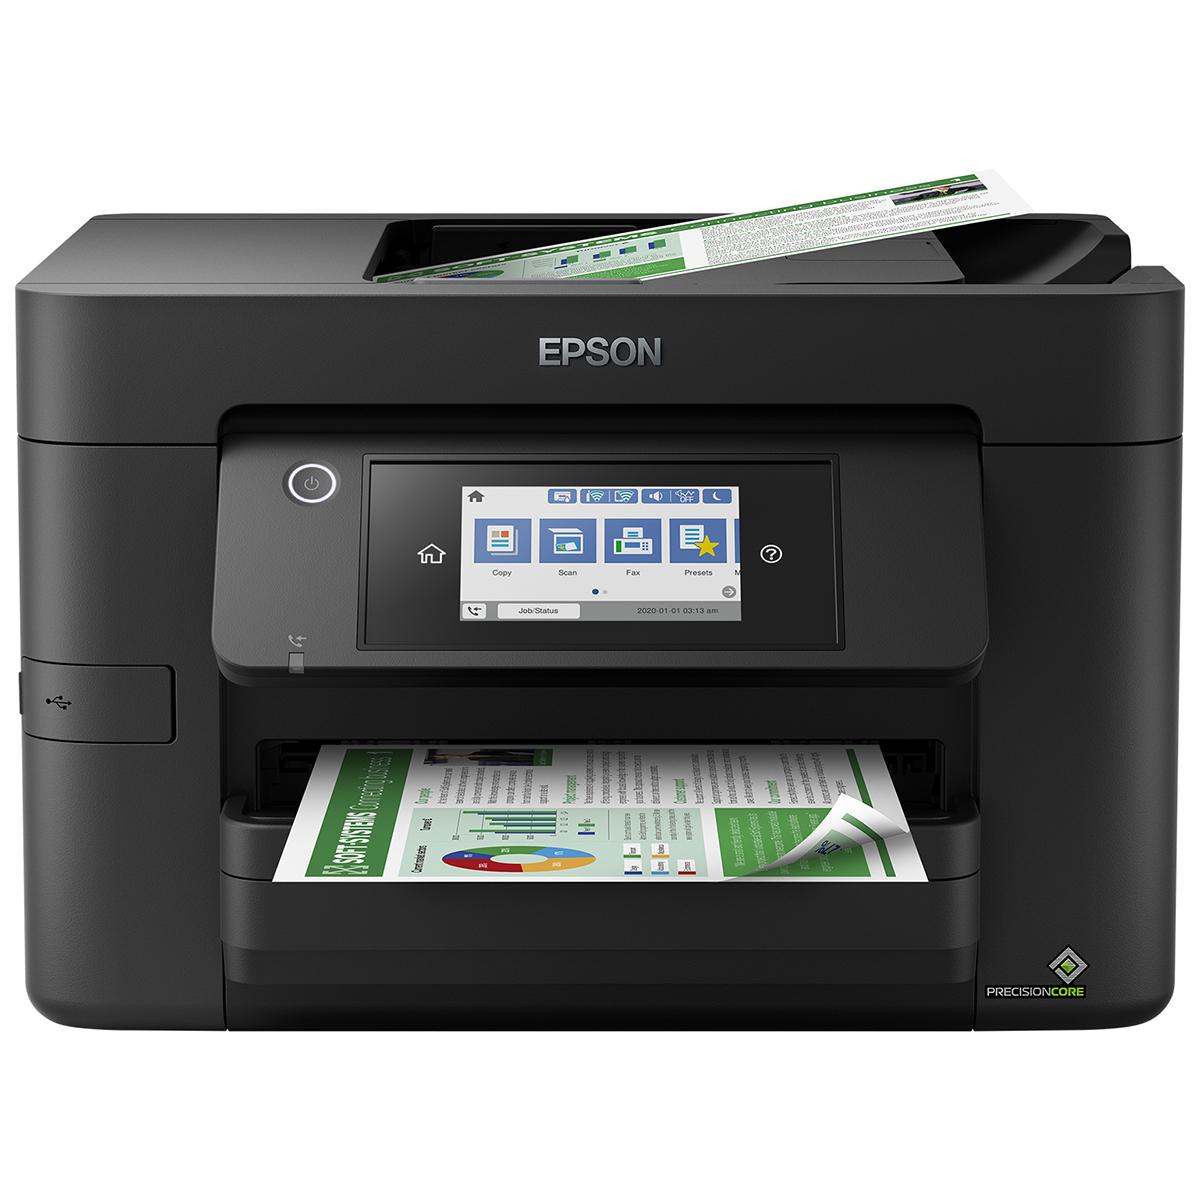 Epson WorkForce PRO WF-4820DWF A4 Colour Inkjet Multifunction